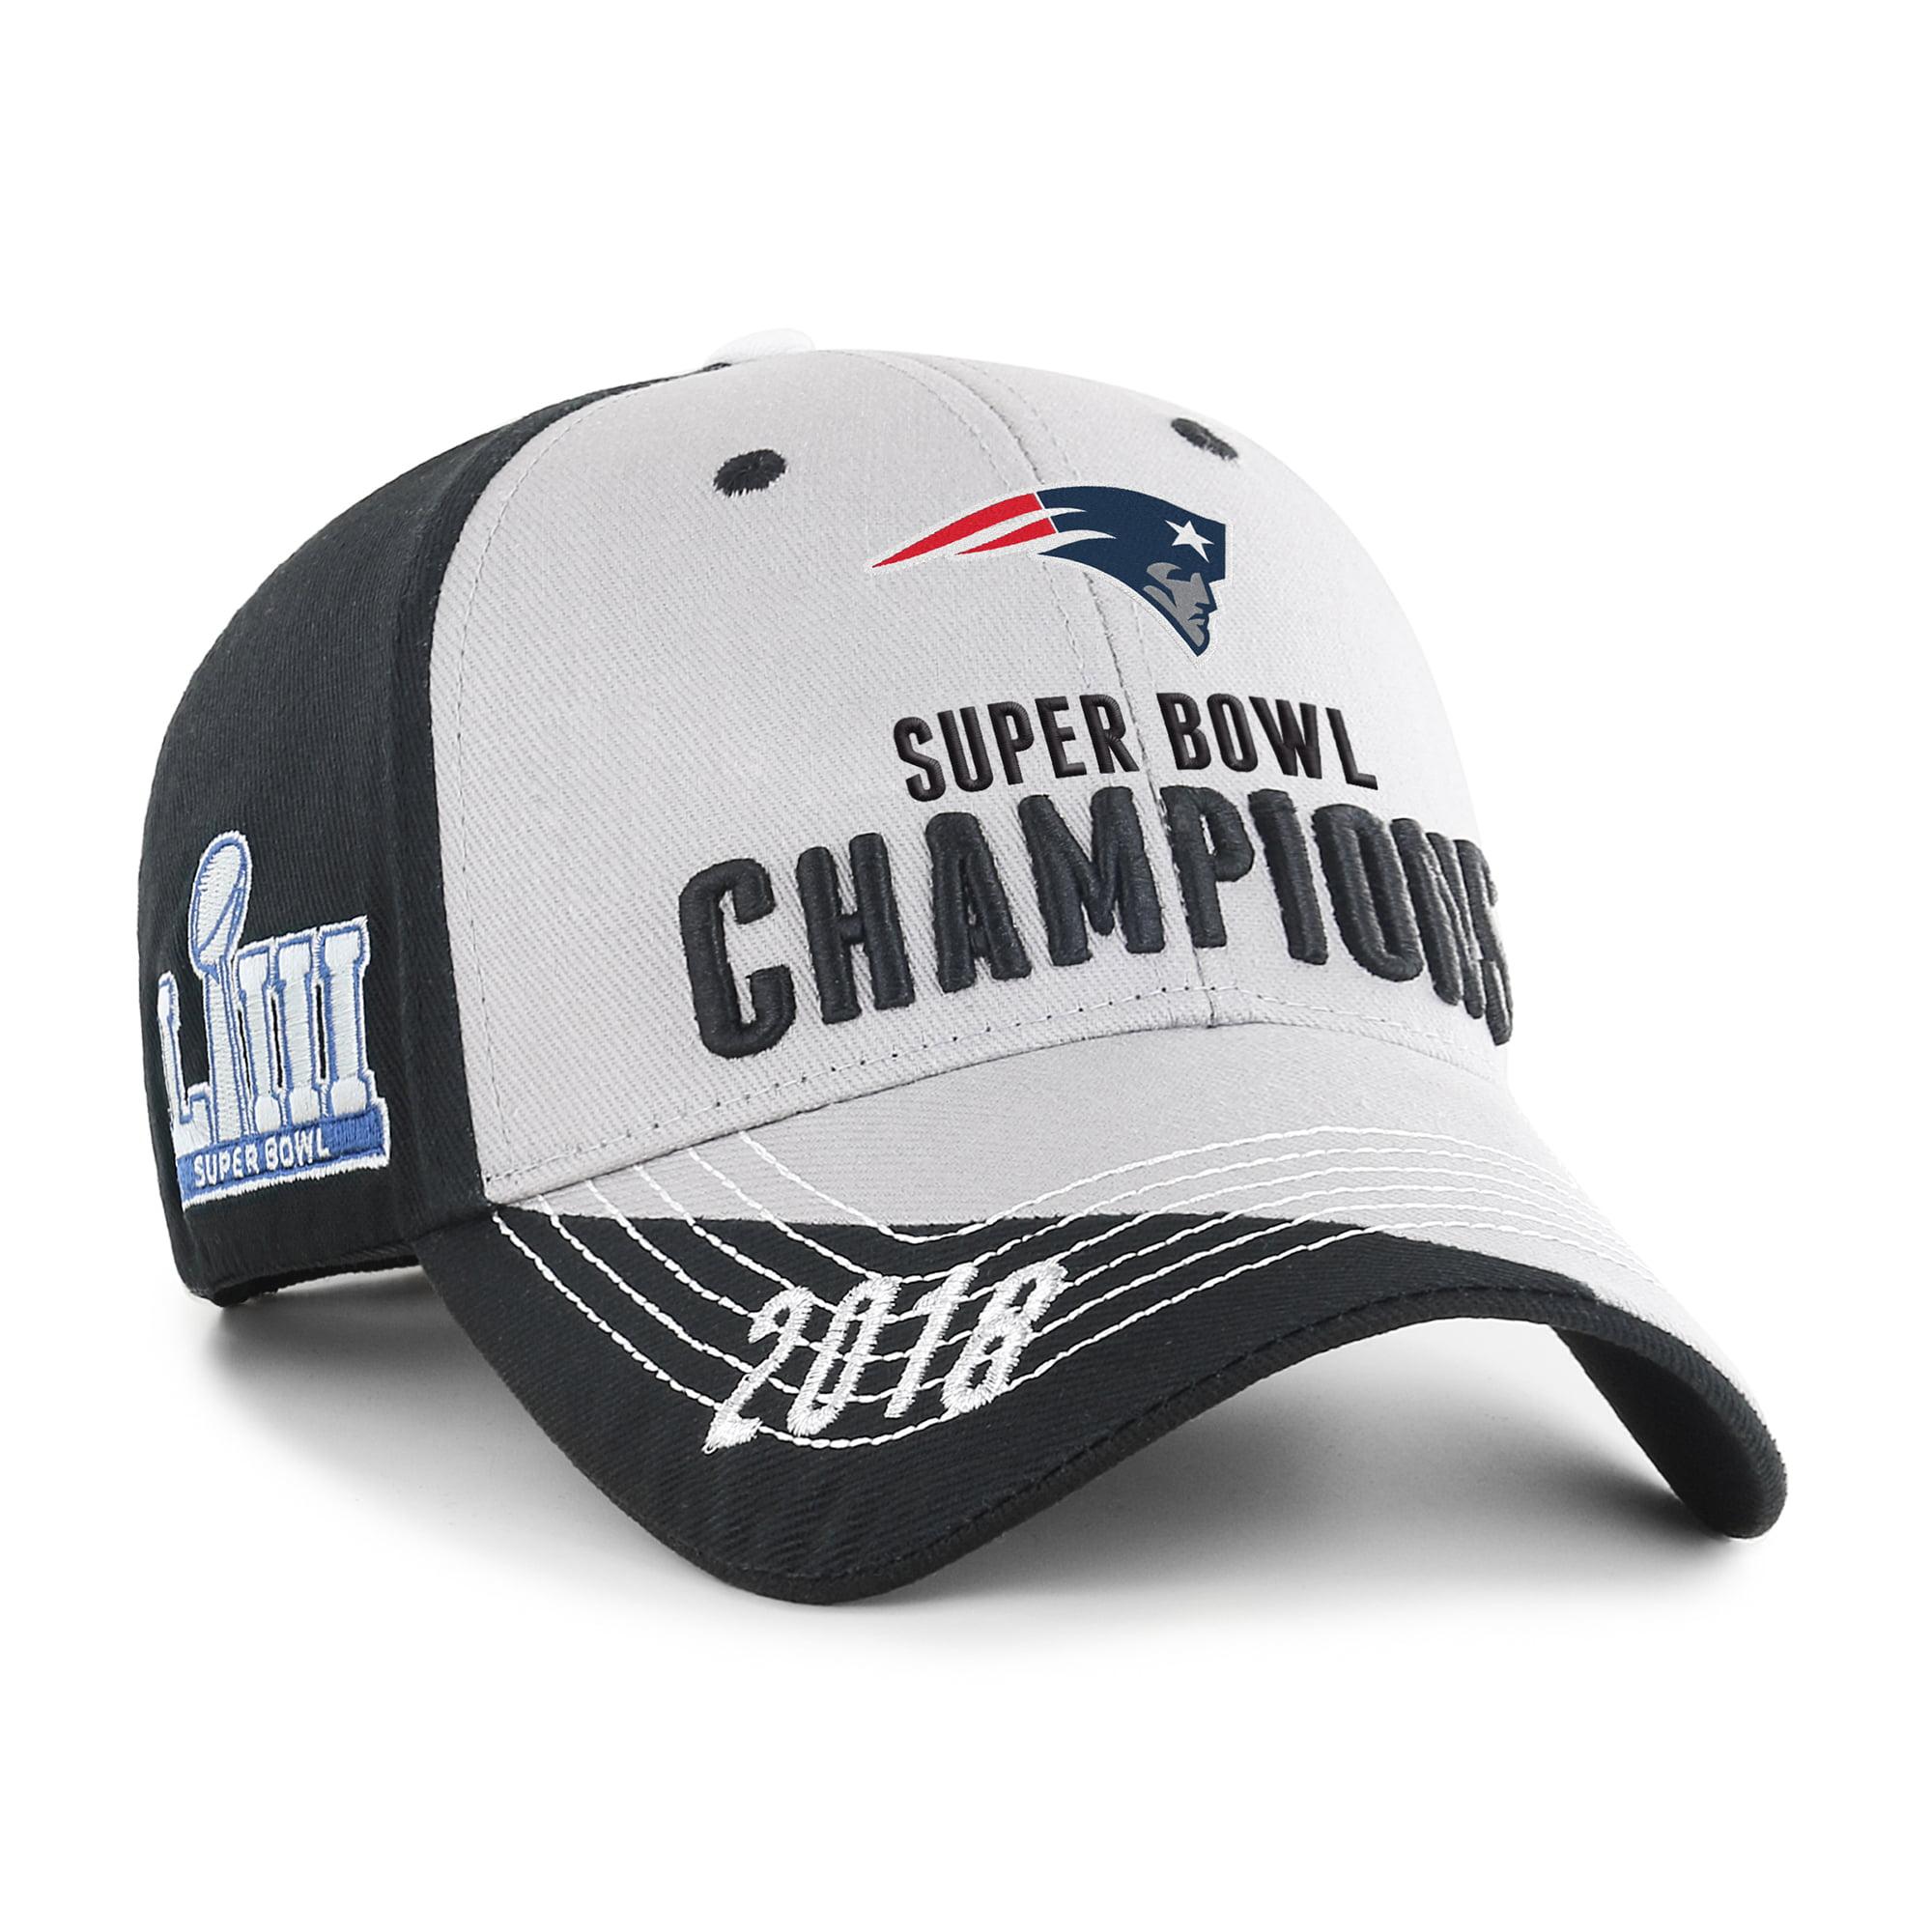 Fan Favorite NFL Super Bowl LIII Champs Hubris, New England Patriots